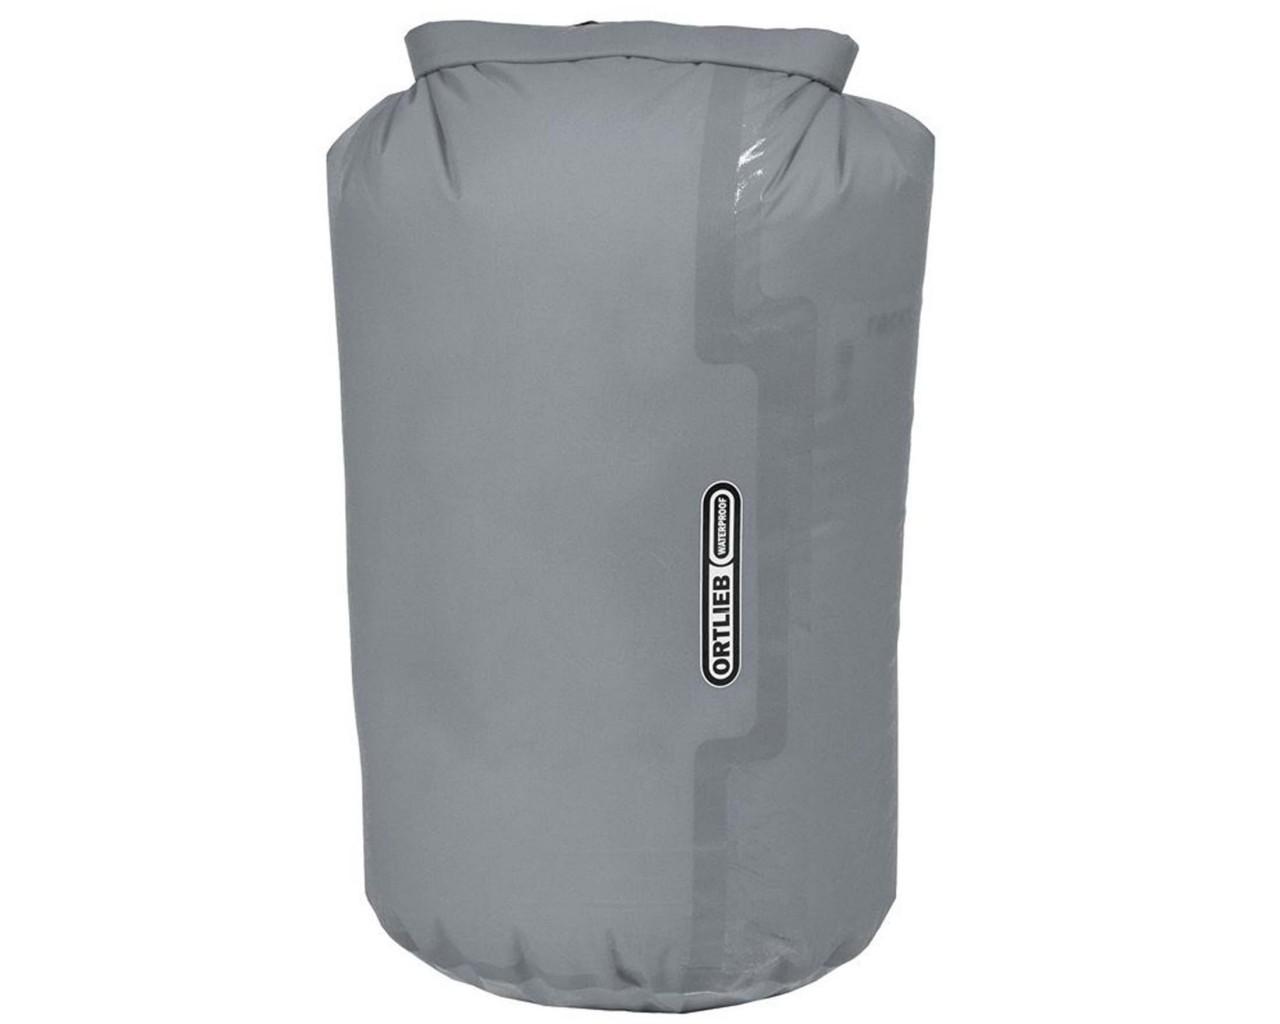 Ortlieb dry bag PS10 - 12 liter   light grey